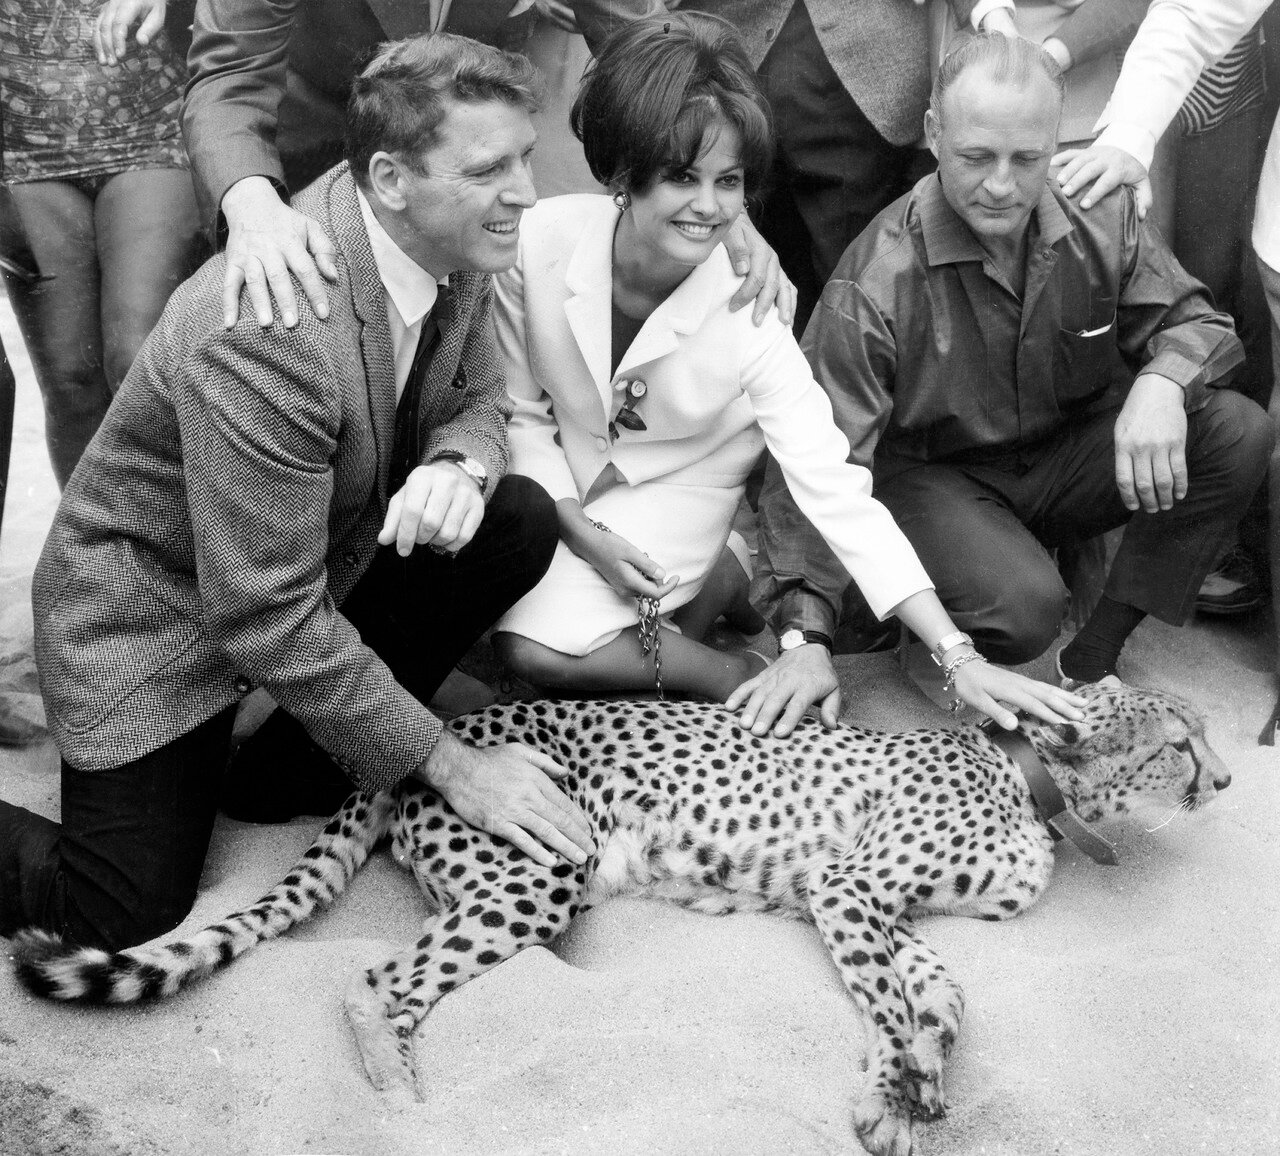 Claudia CARDINALE, Burt LANCASTER und Luchino VISCONTI, 1963